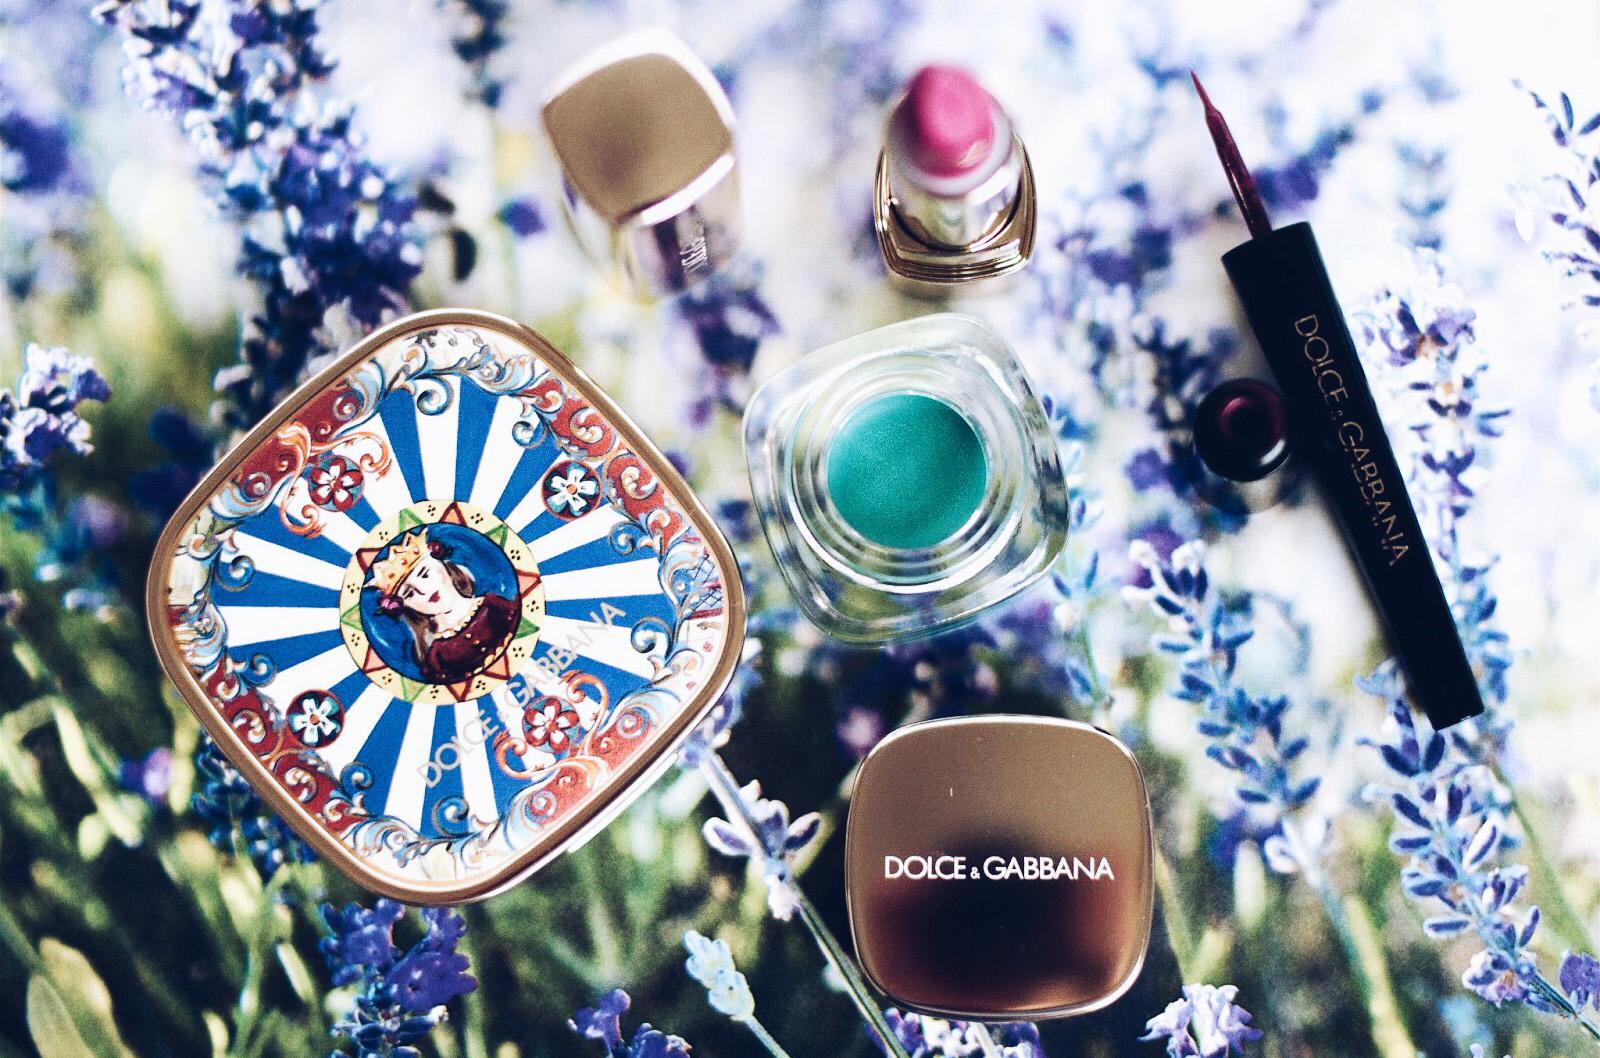 dolce gabbana maquillage ete 201§ italian bronzer mono turquoise eyeliner 9 cyclamen lipstick cyclamen avis test swatch